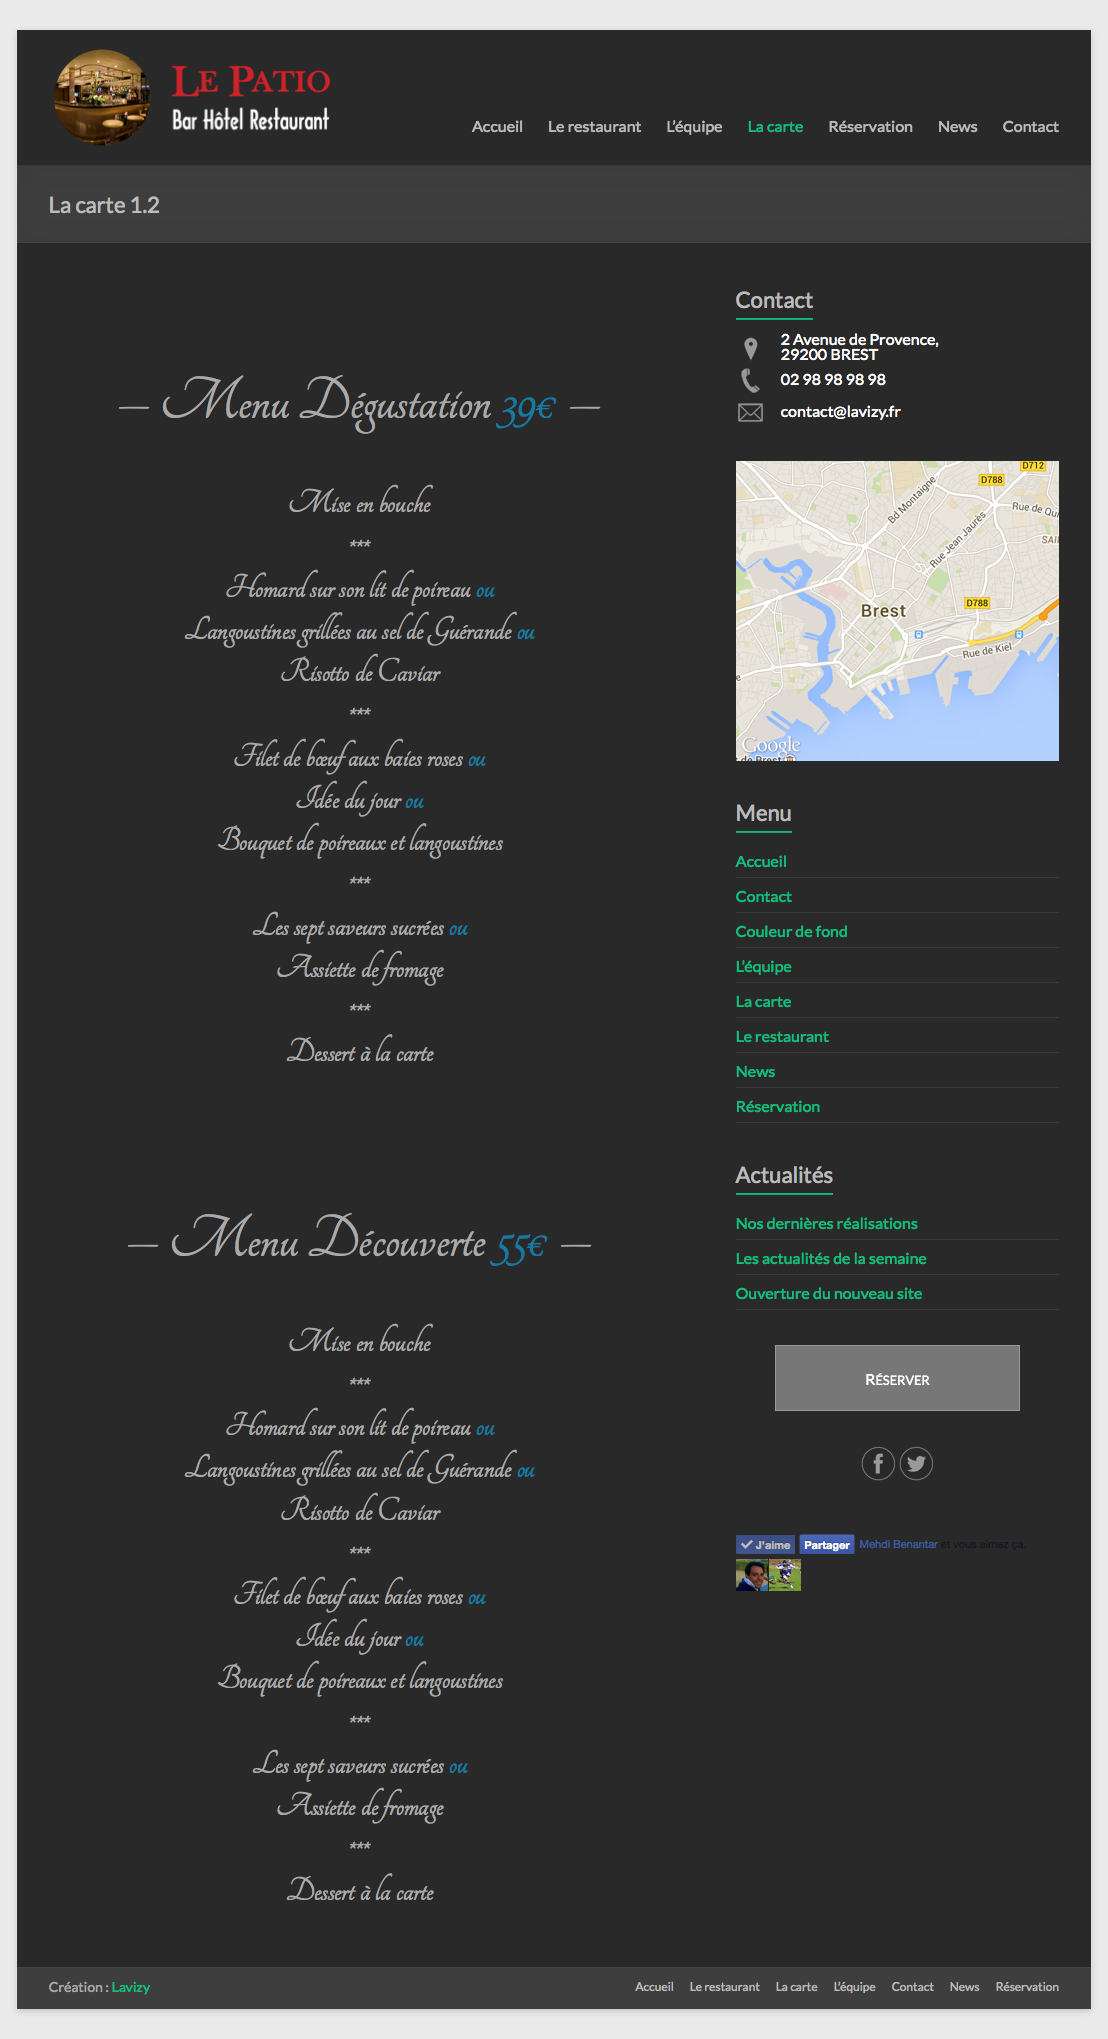 La carte 1.2 | space local 2014-10-20 14-46-13